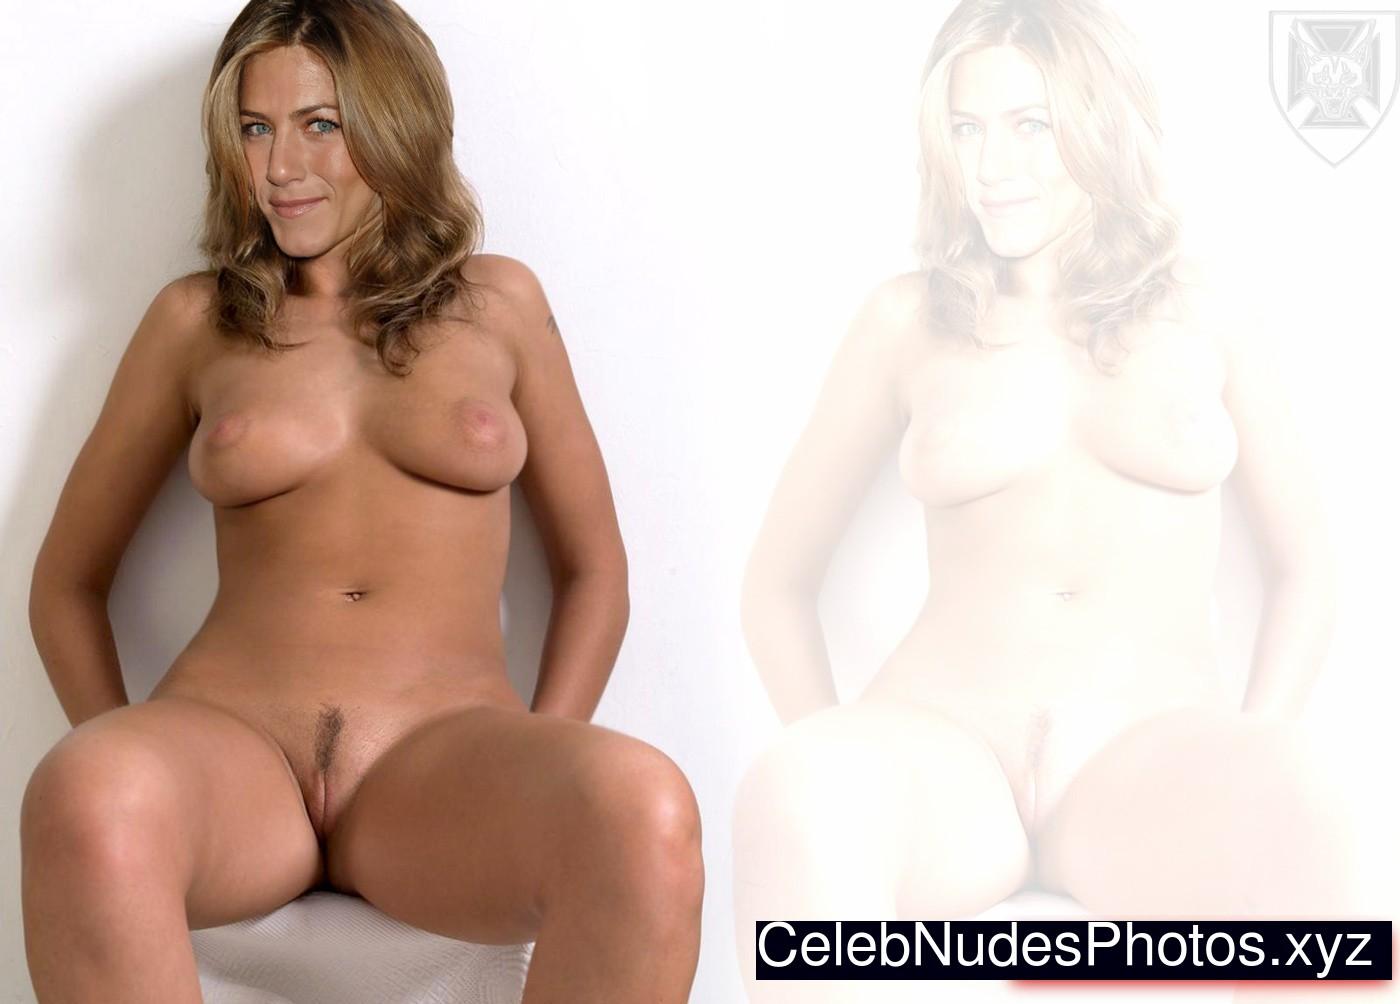 Naked cute girls kissing